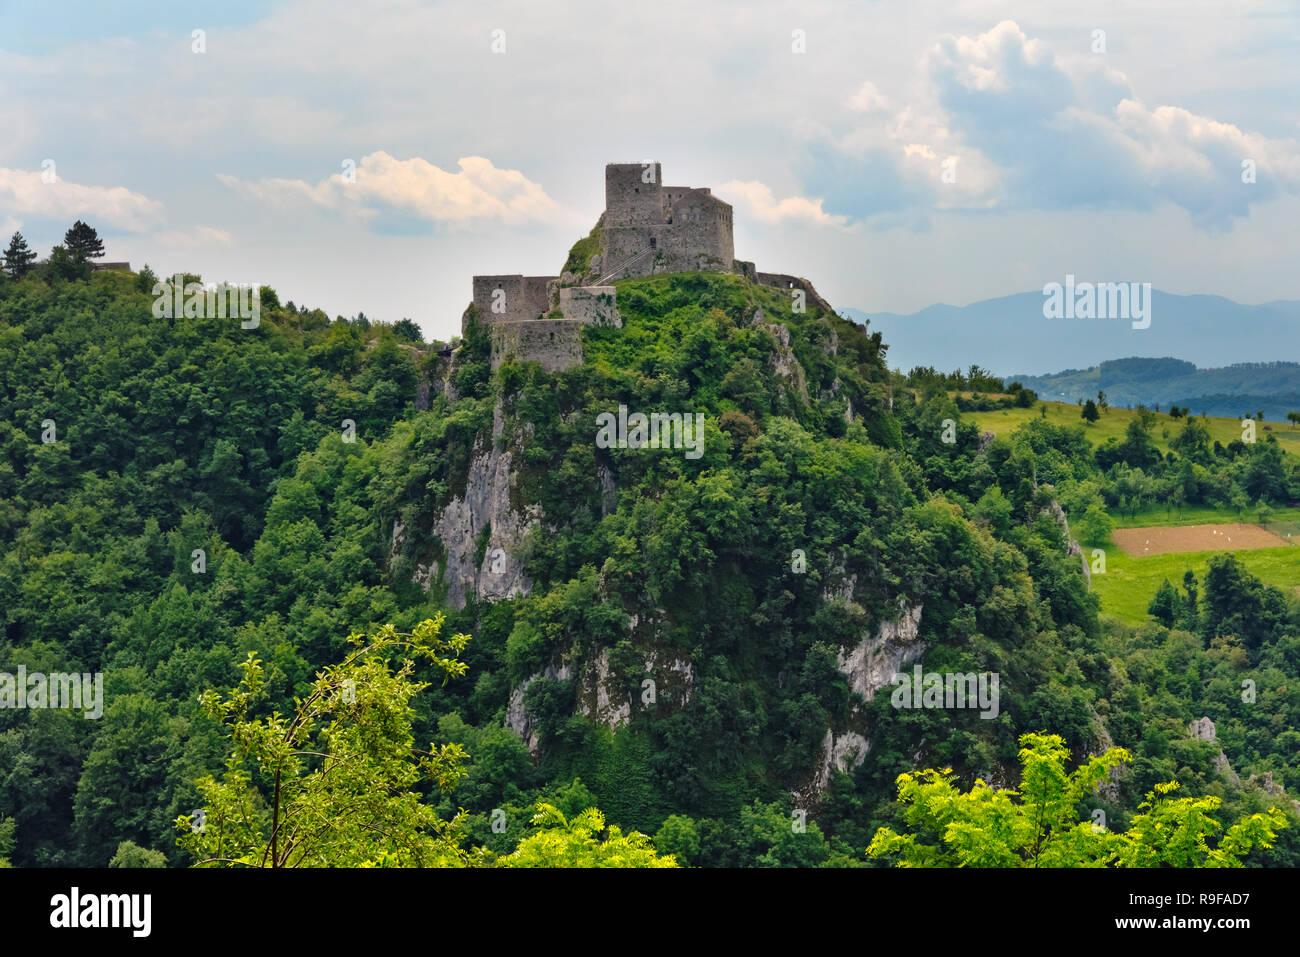 Srebrenik Fortress, Bosnia and Herzegovina - Stock Image